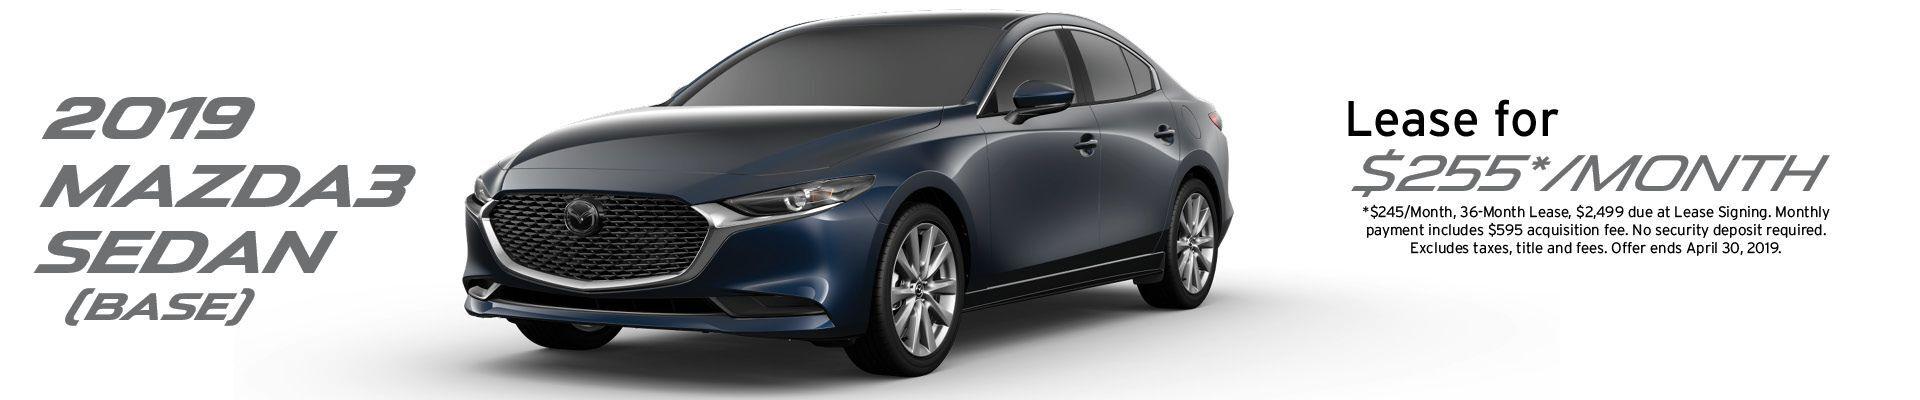 2019 Mazda3 lease banner